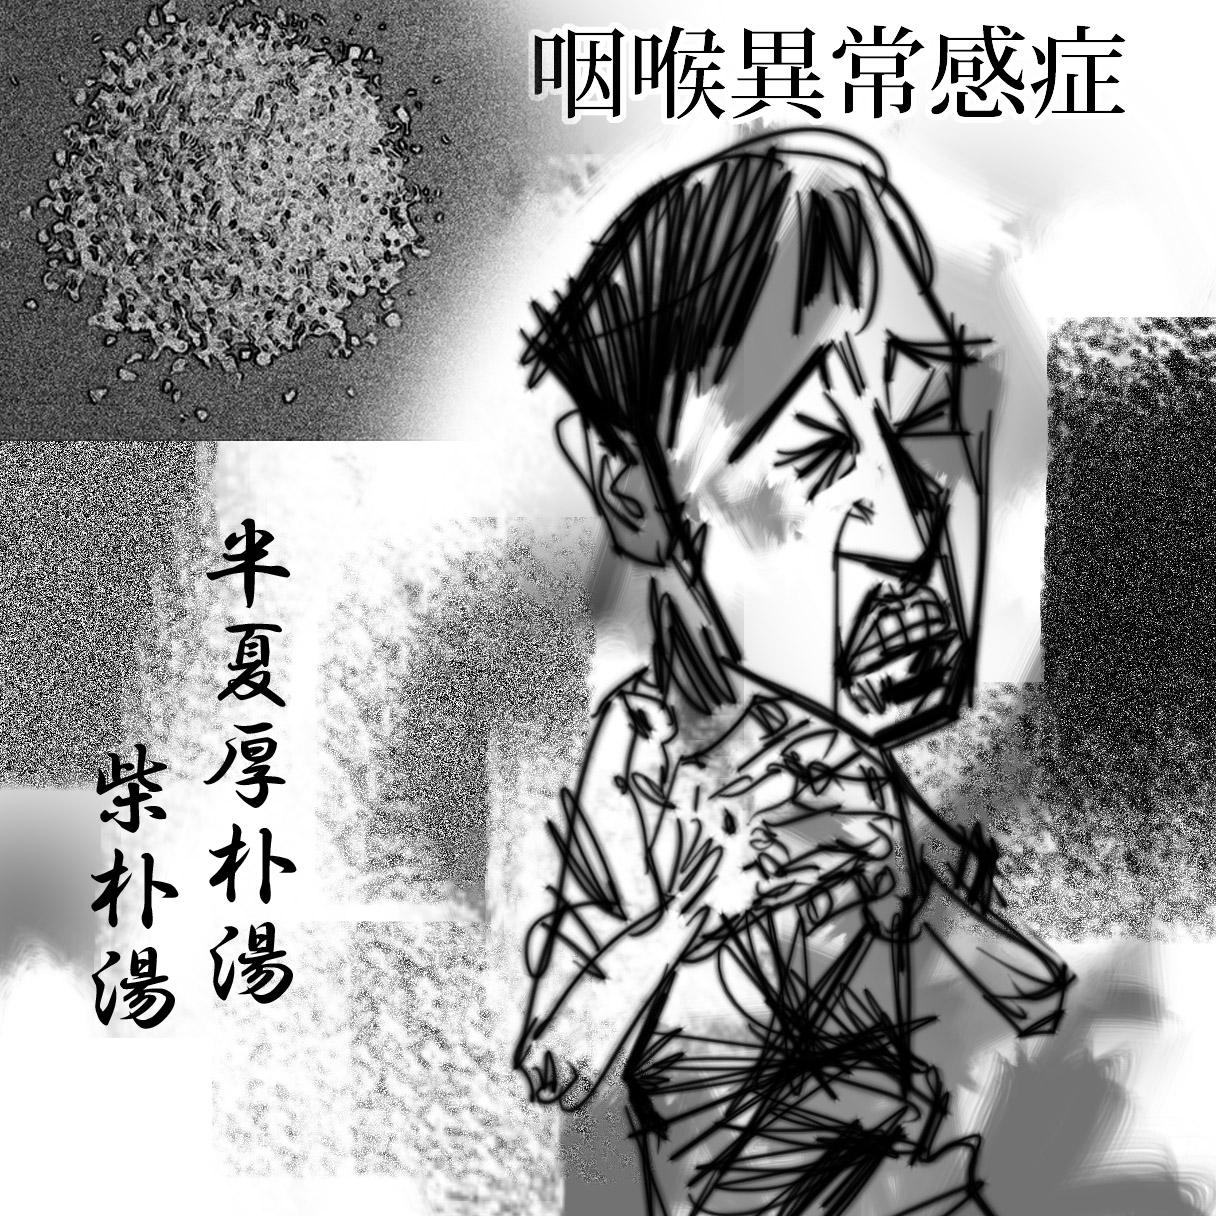 20130113_column三浦医師3本目12月胸が詰まった感じ